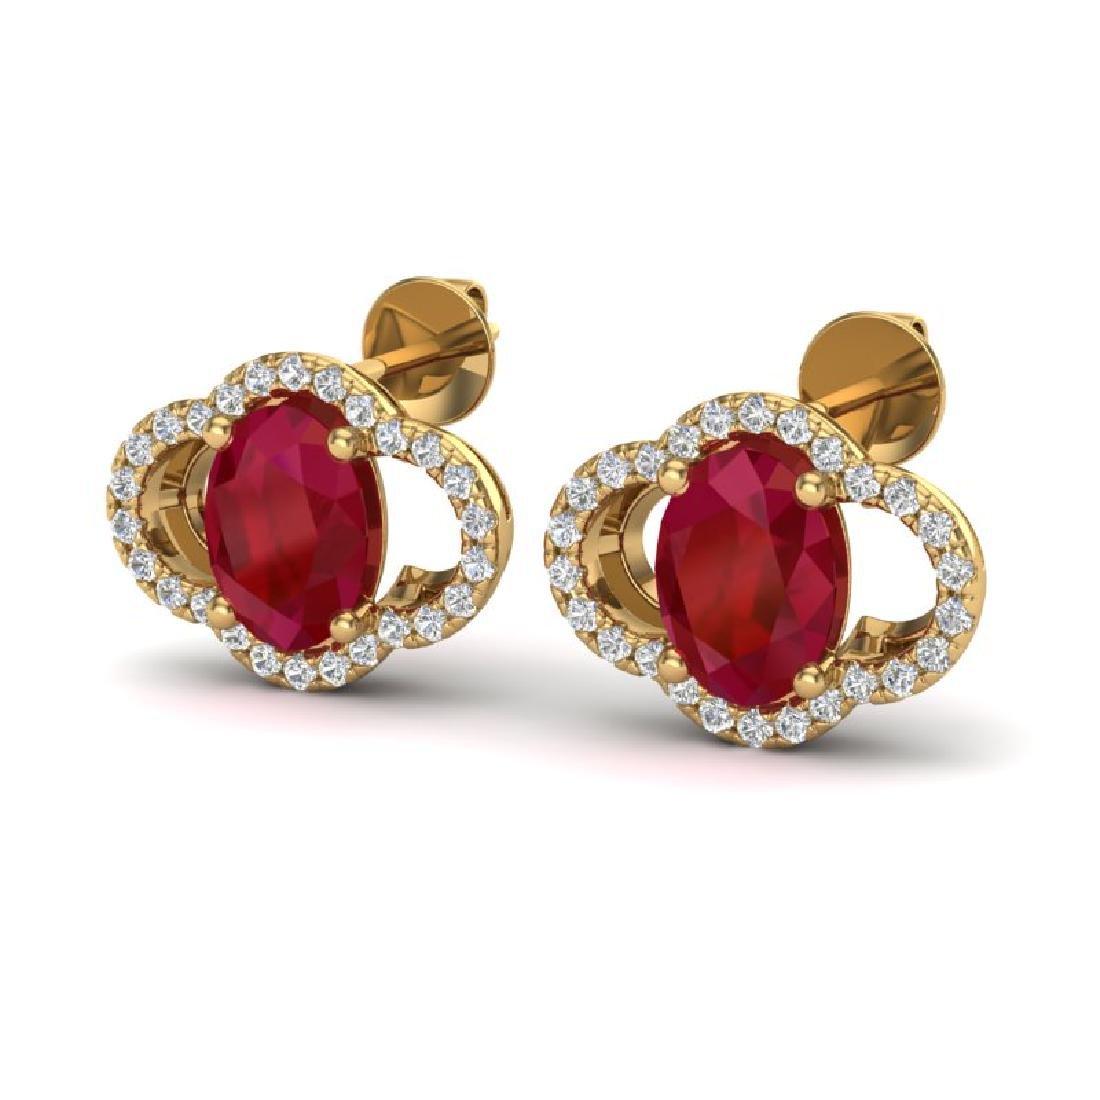 4 CTW Ruby & Micro Pave VS/SI Diamond Earrings 10K